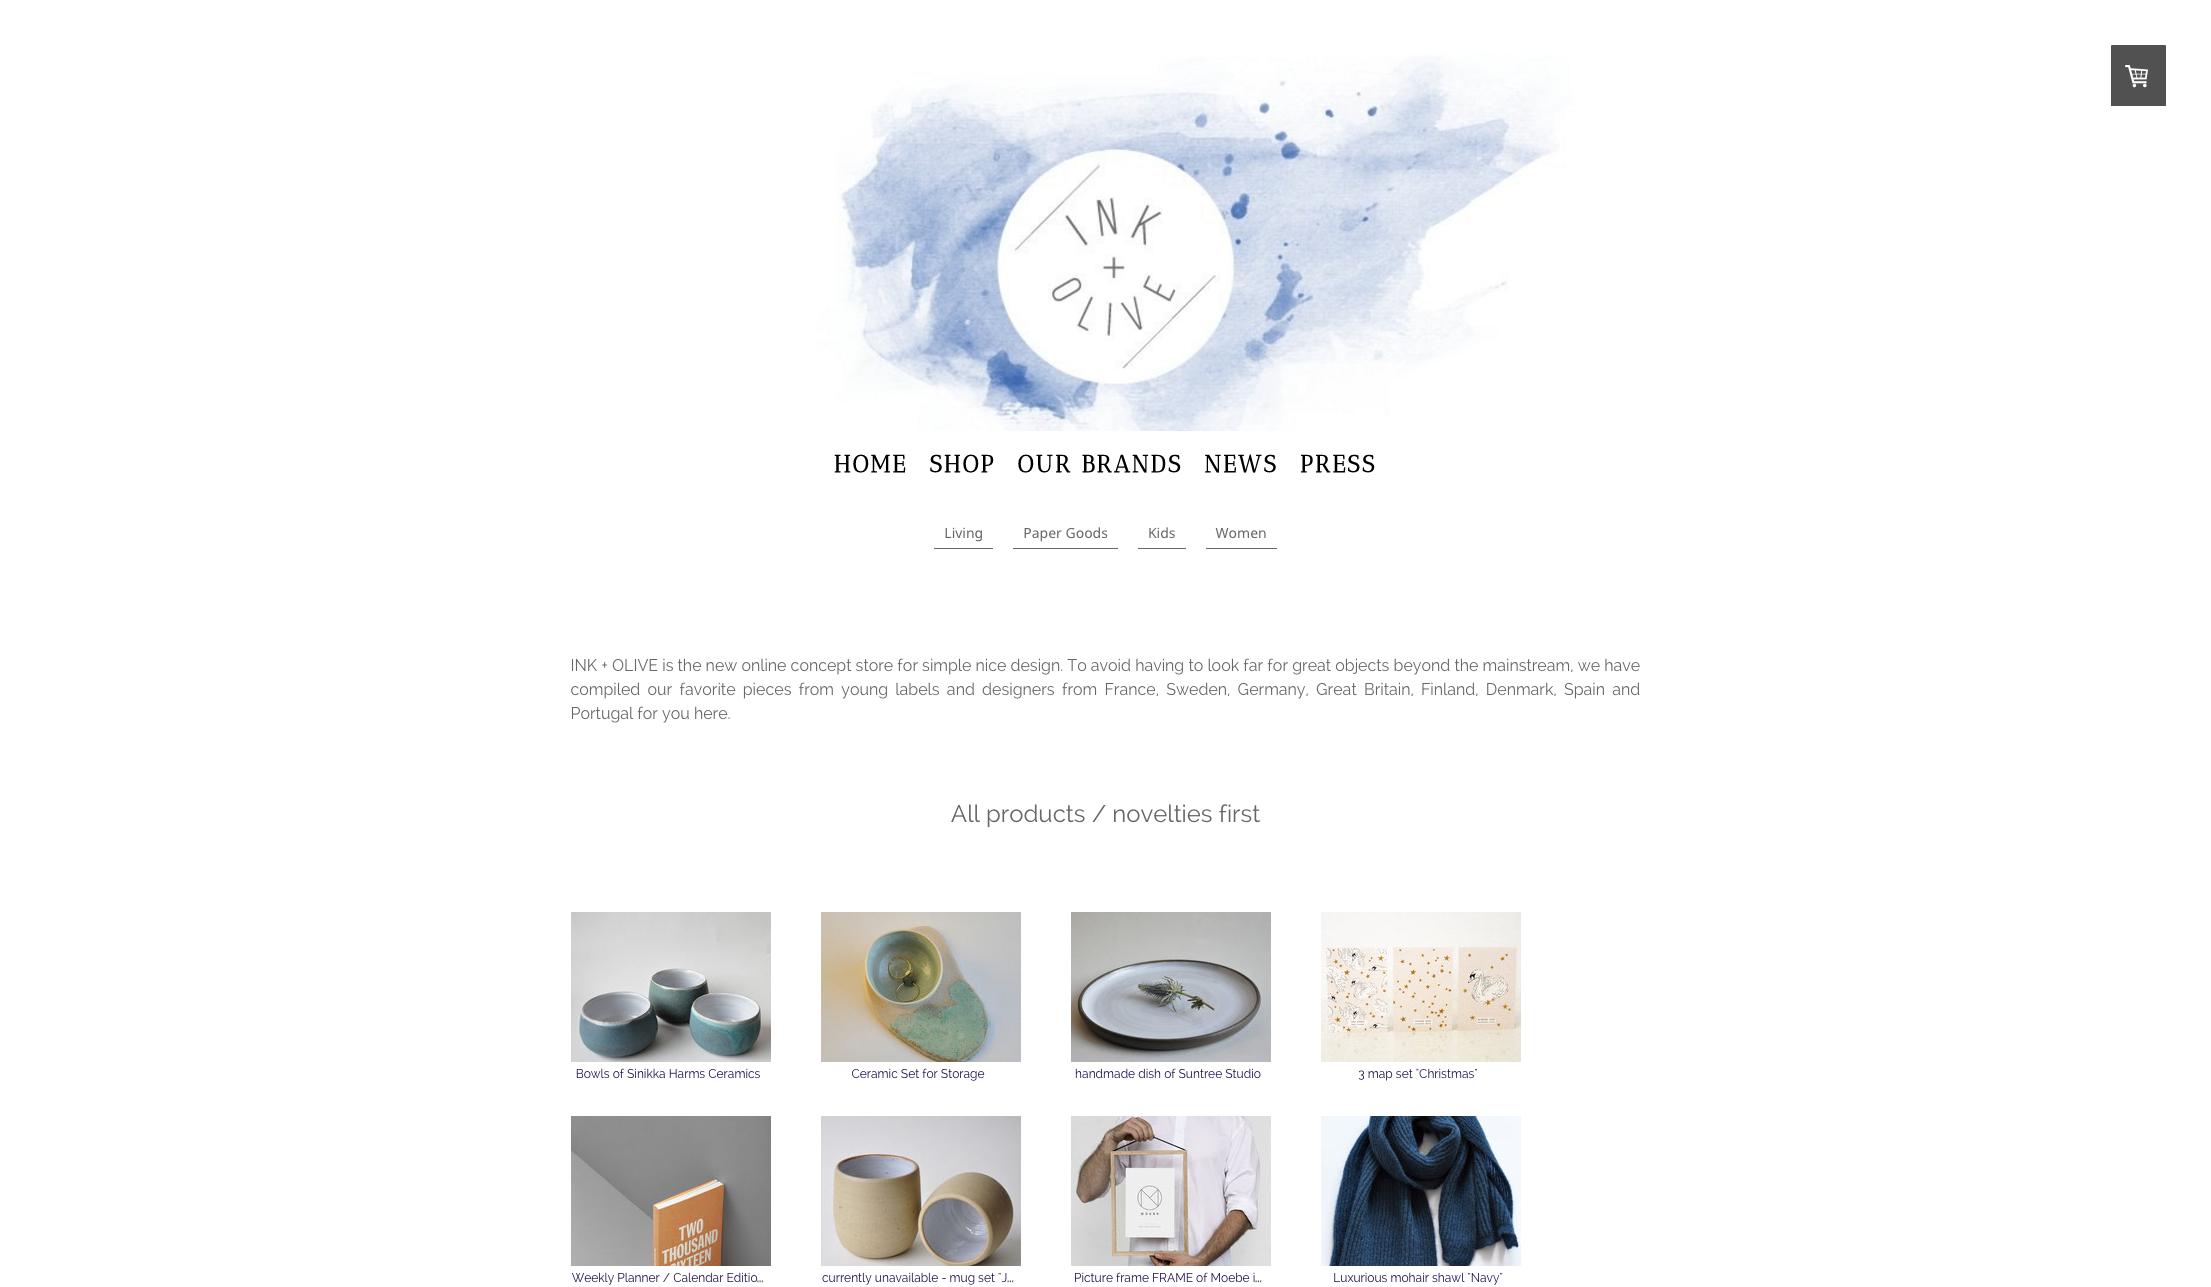 Jimdo website using Zurich template